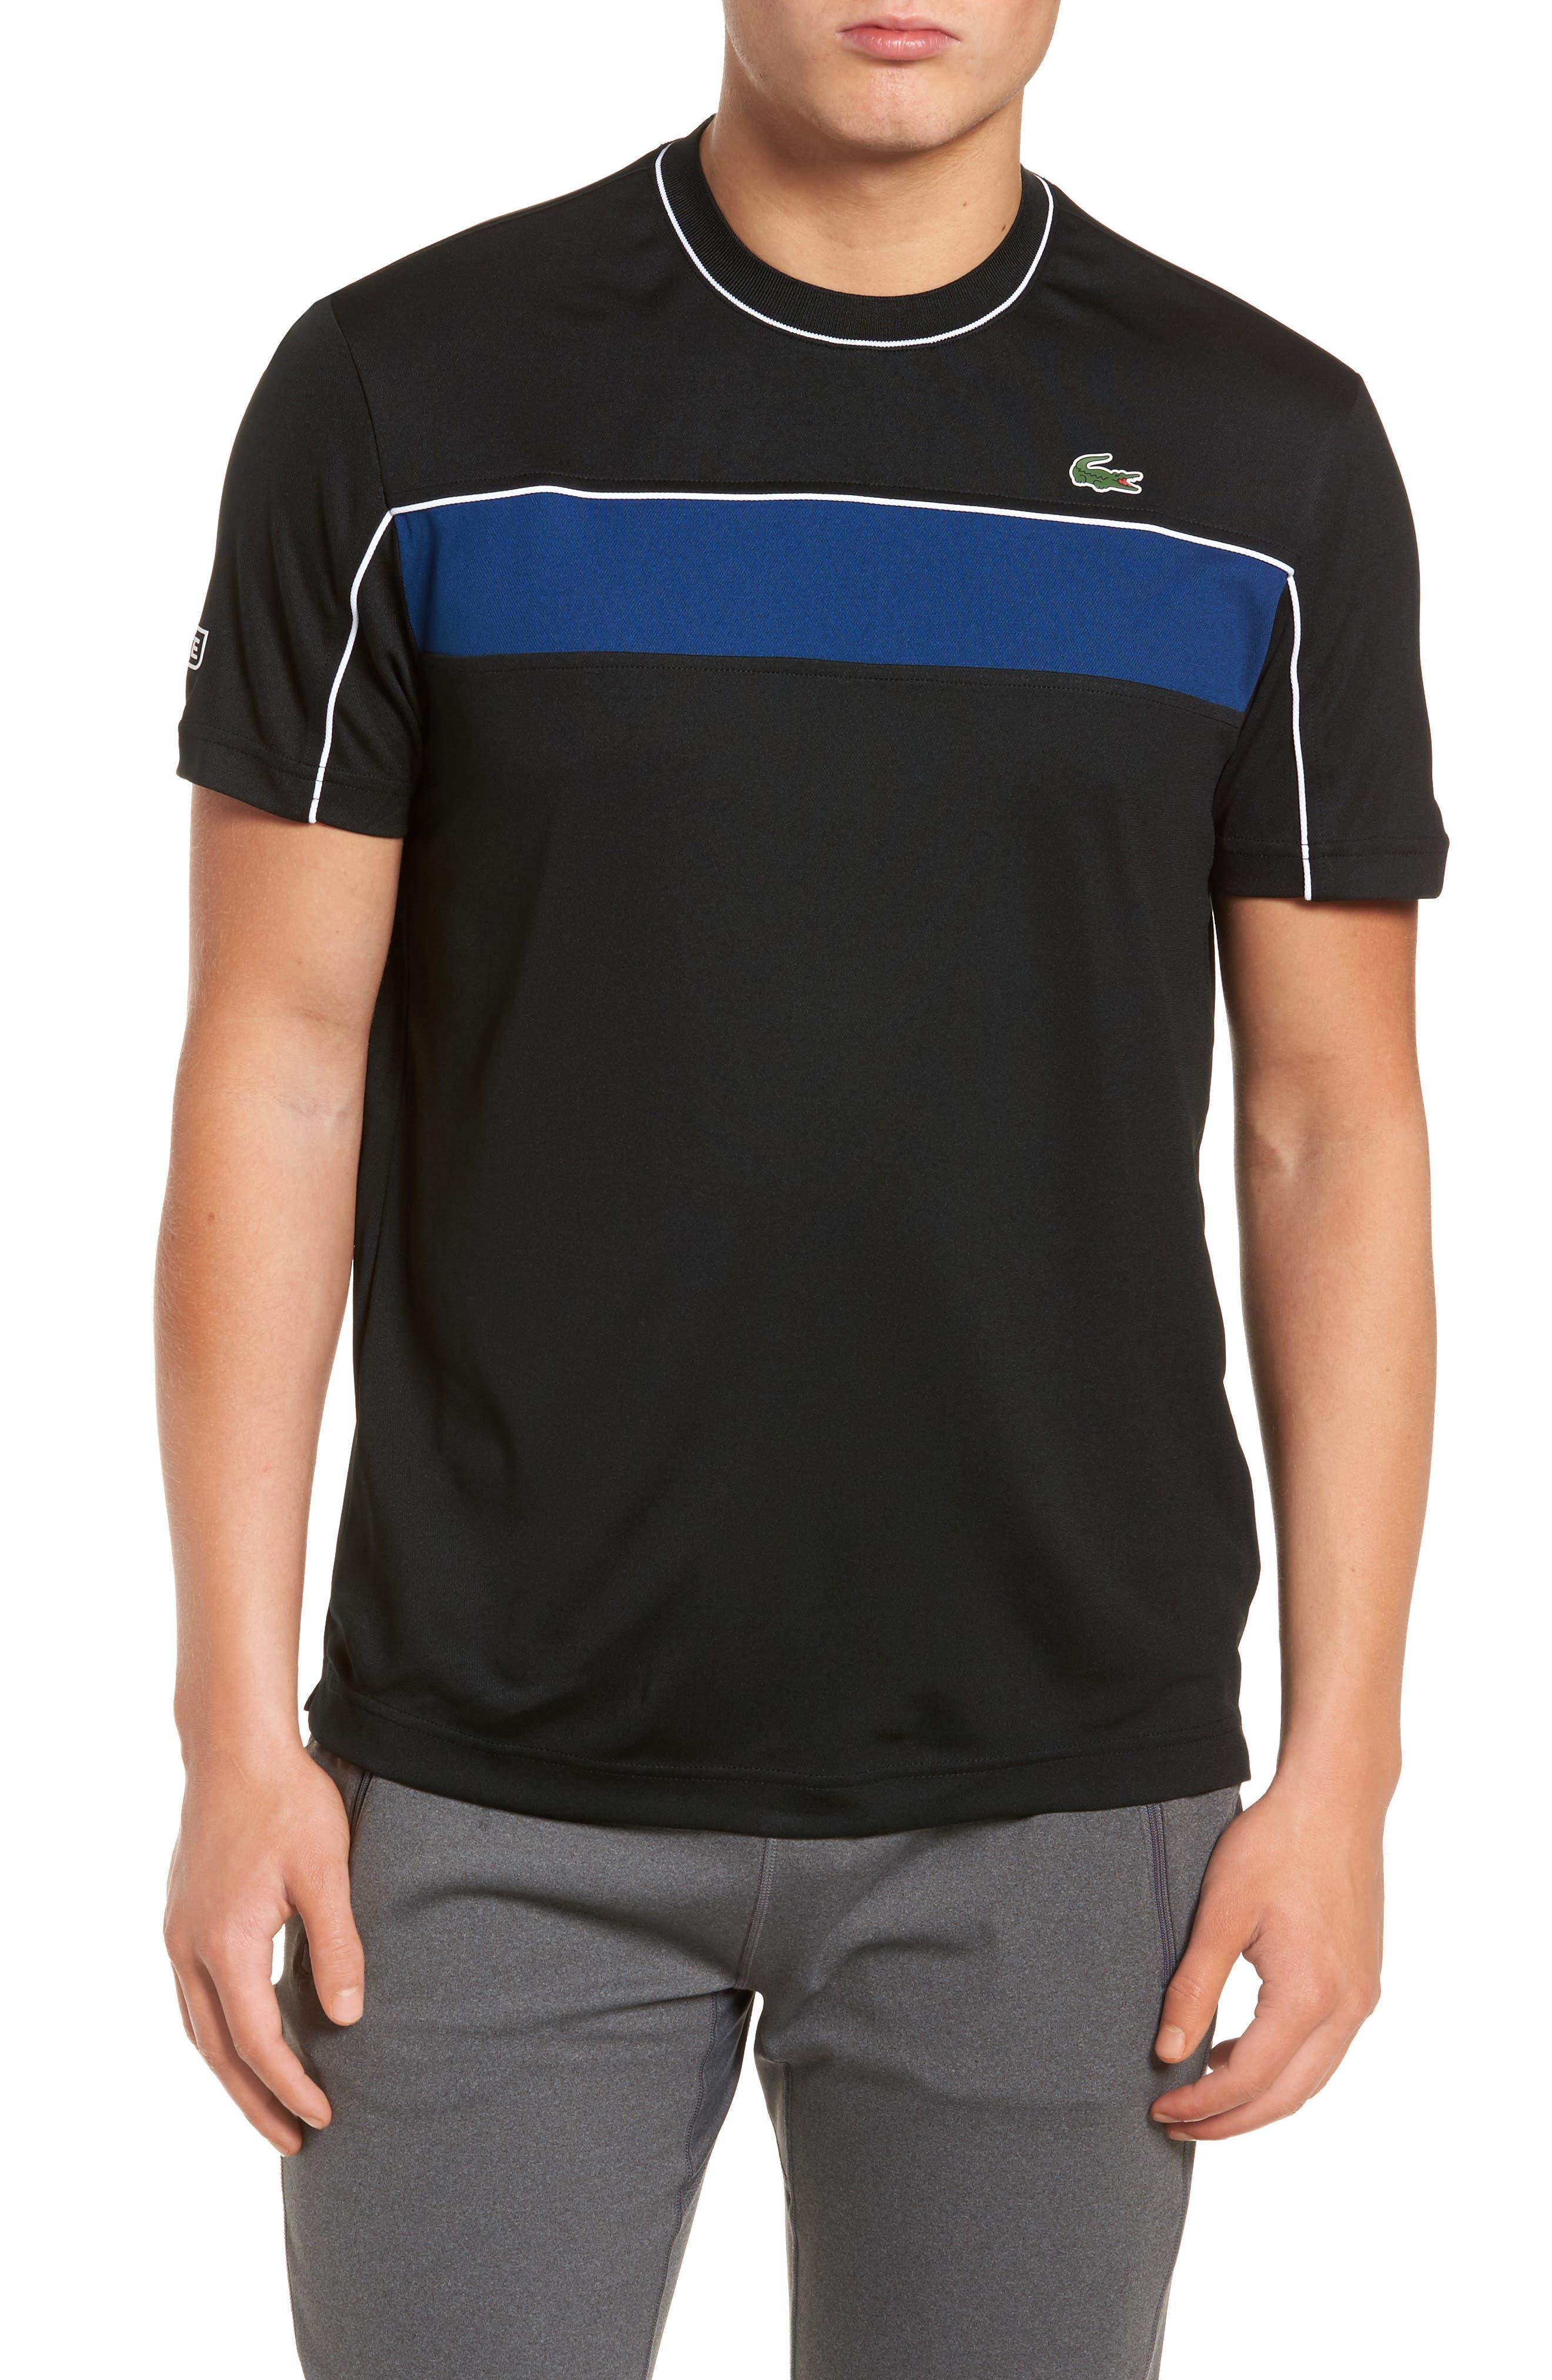 Piqué T-Shirt,                             Main thumbnail 1, color,                             Black/ Marino/ White